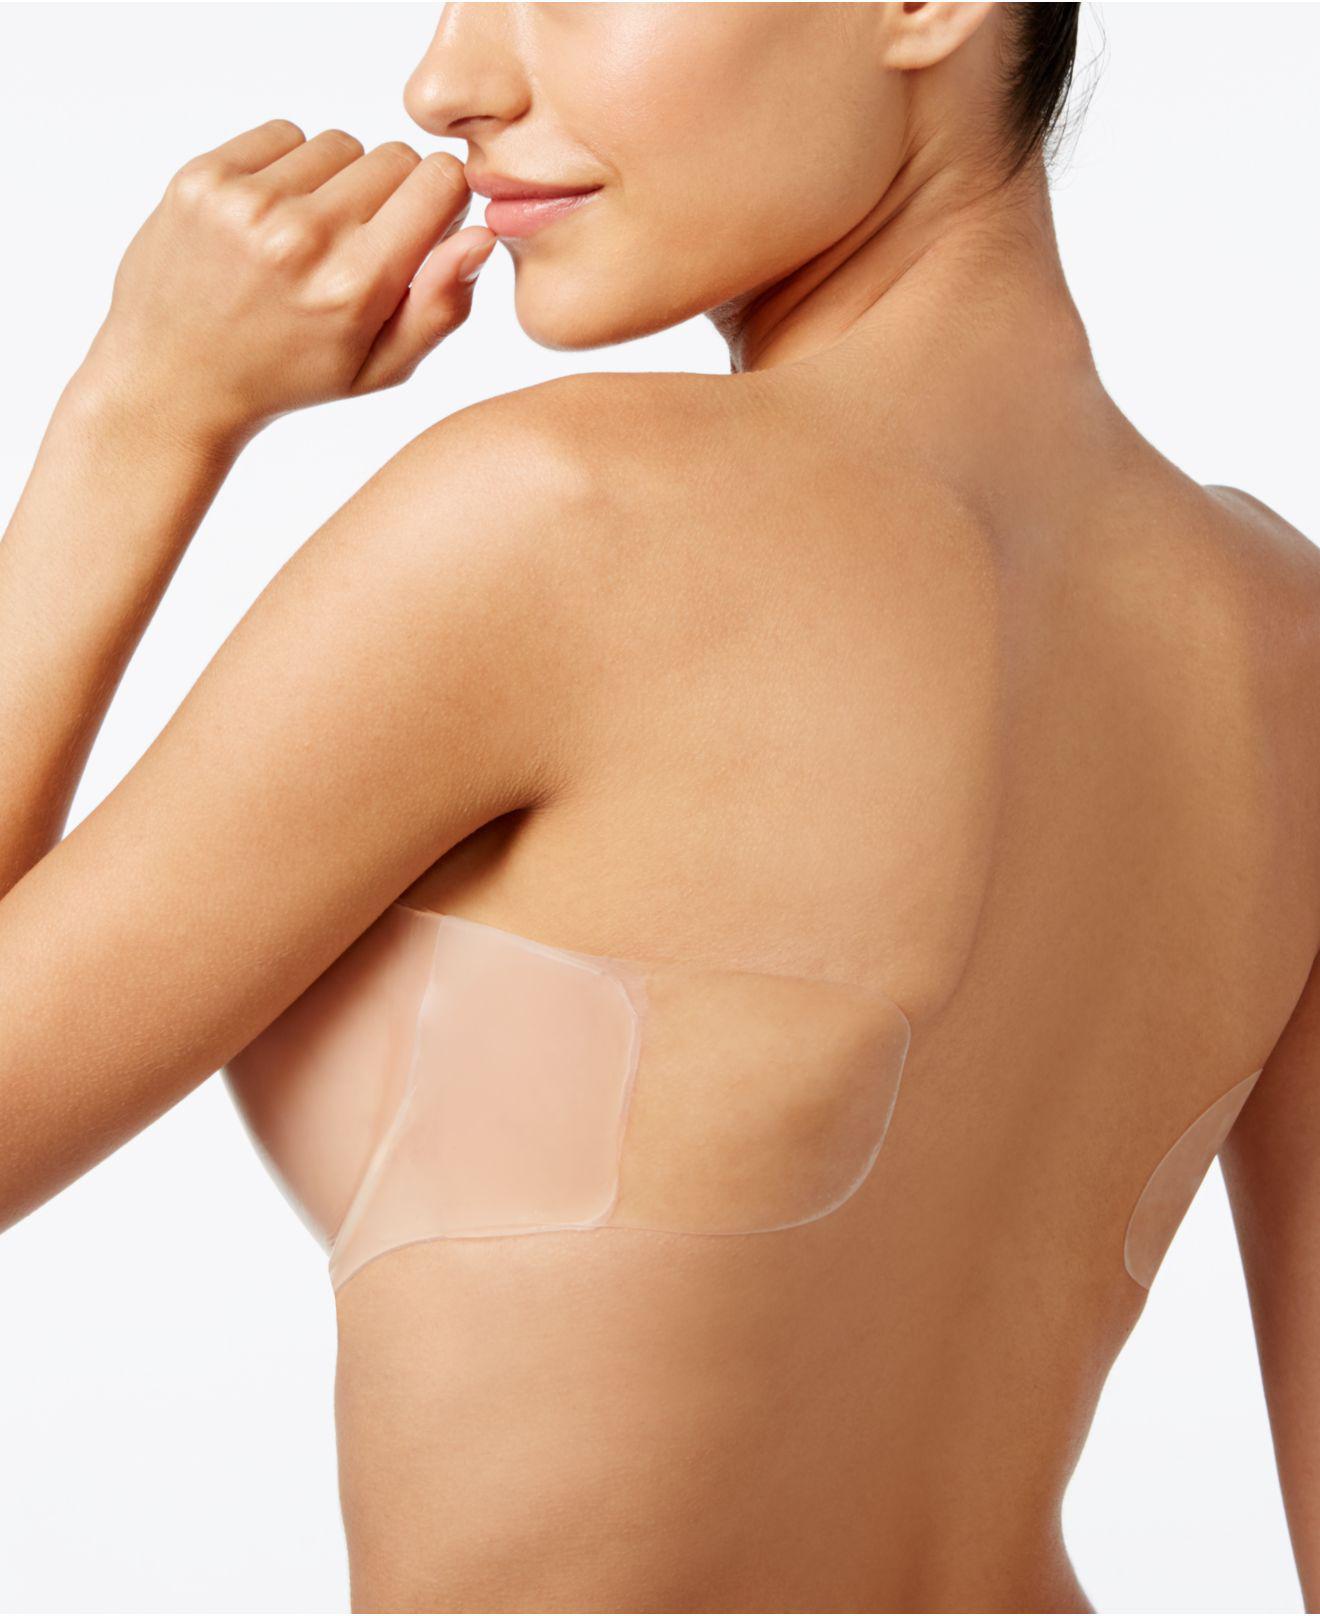 cec336f386f Fashion Forms stick on bra — The Mews